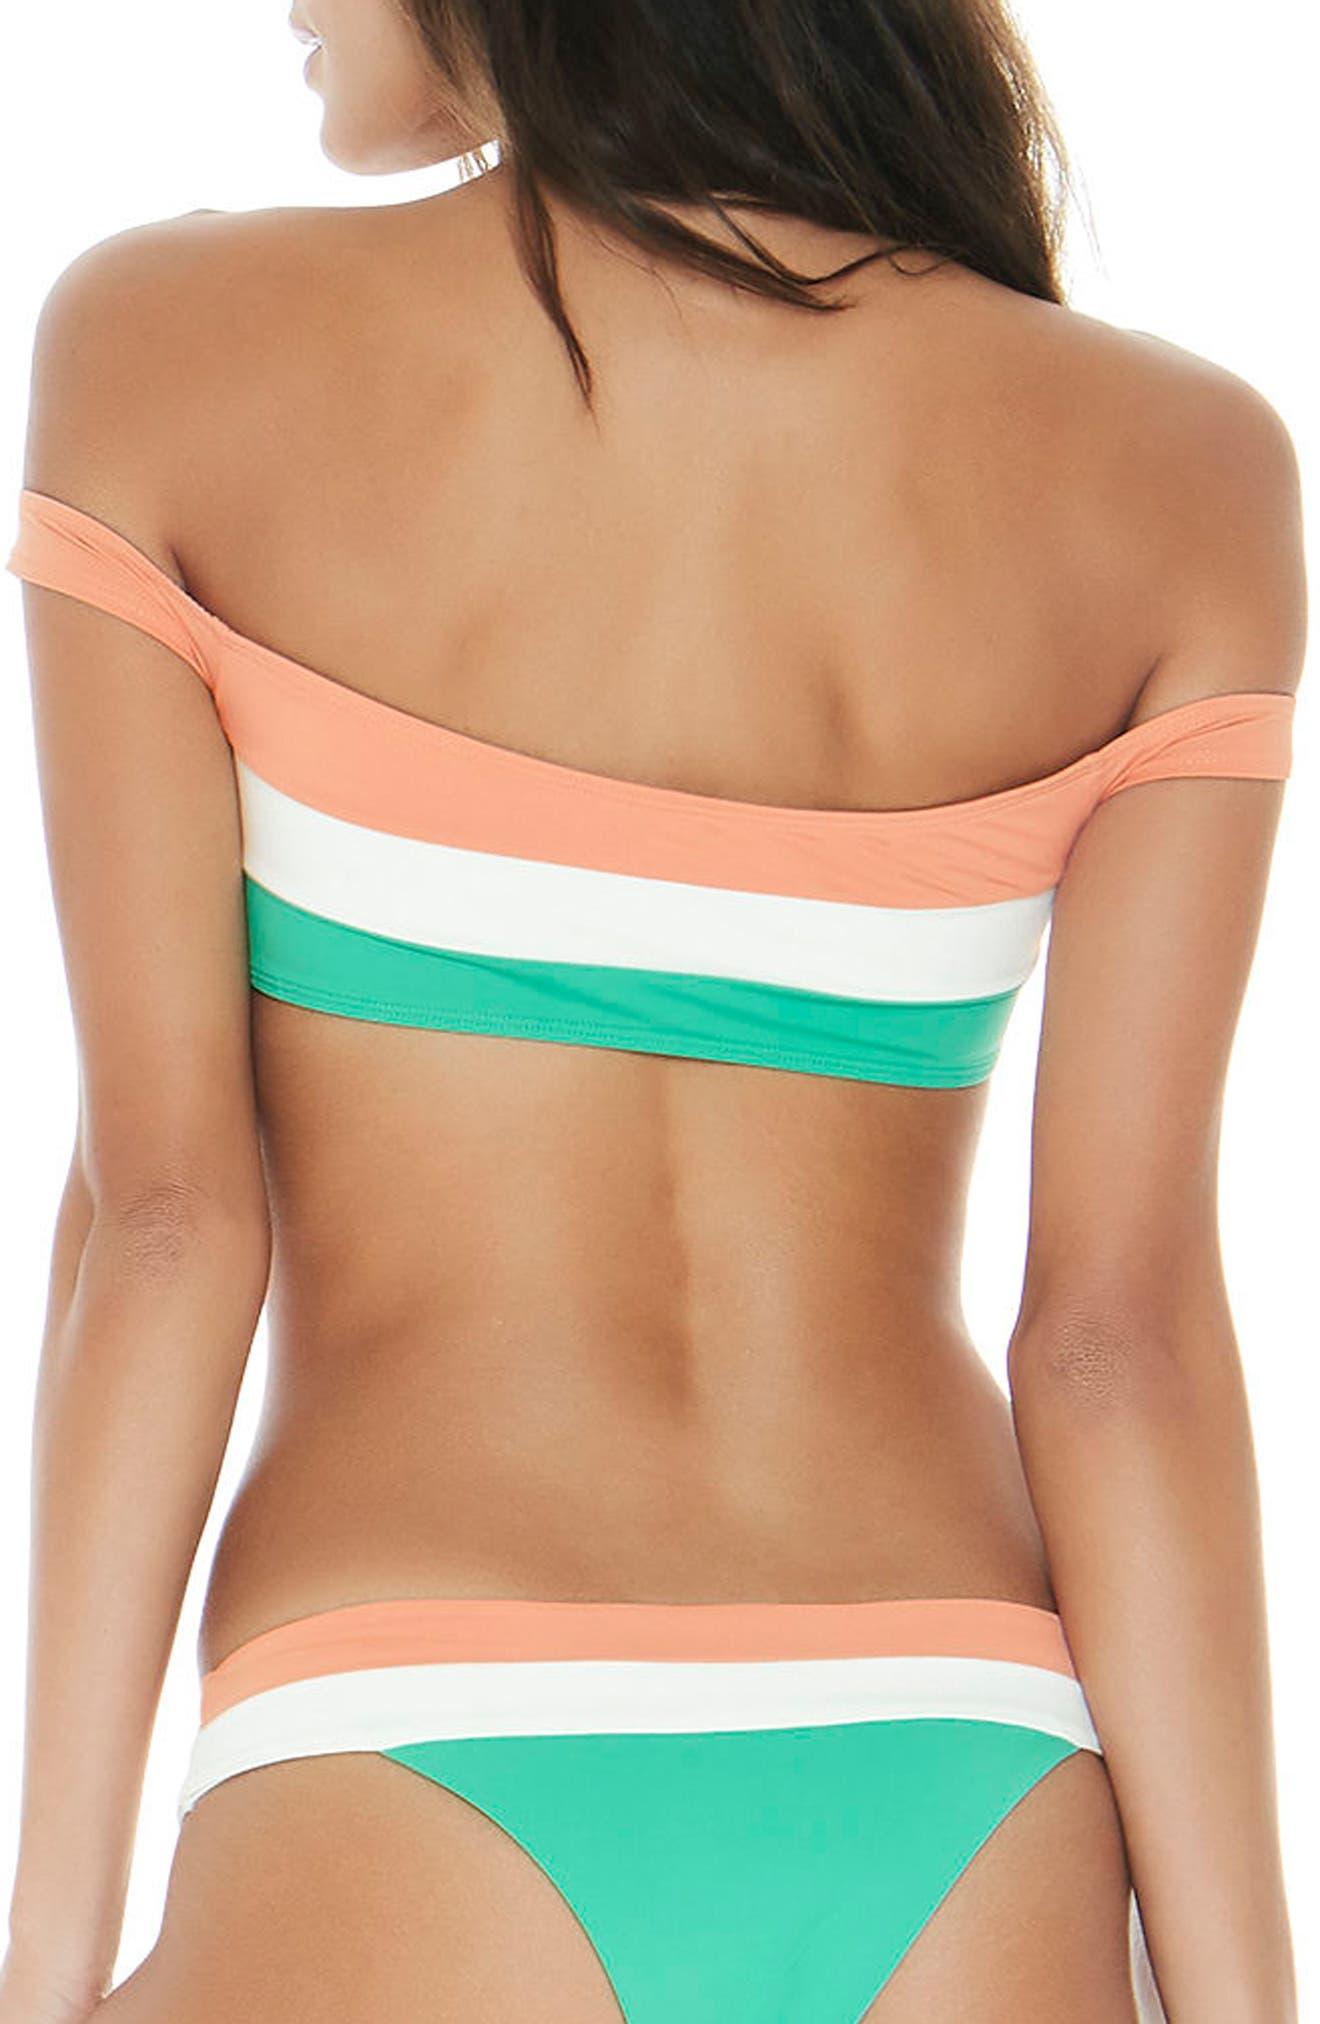 Ziggy Off the Shoulder Bikini Top,                             Alternate thumbnail 2, color,                             900